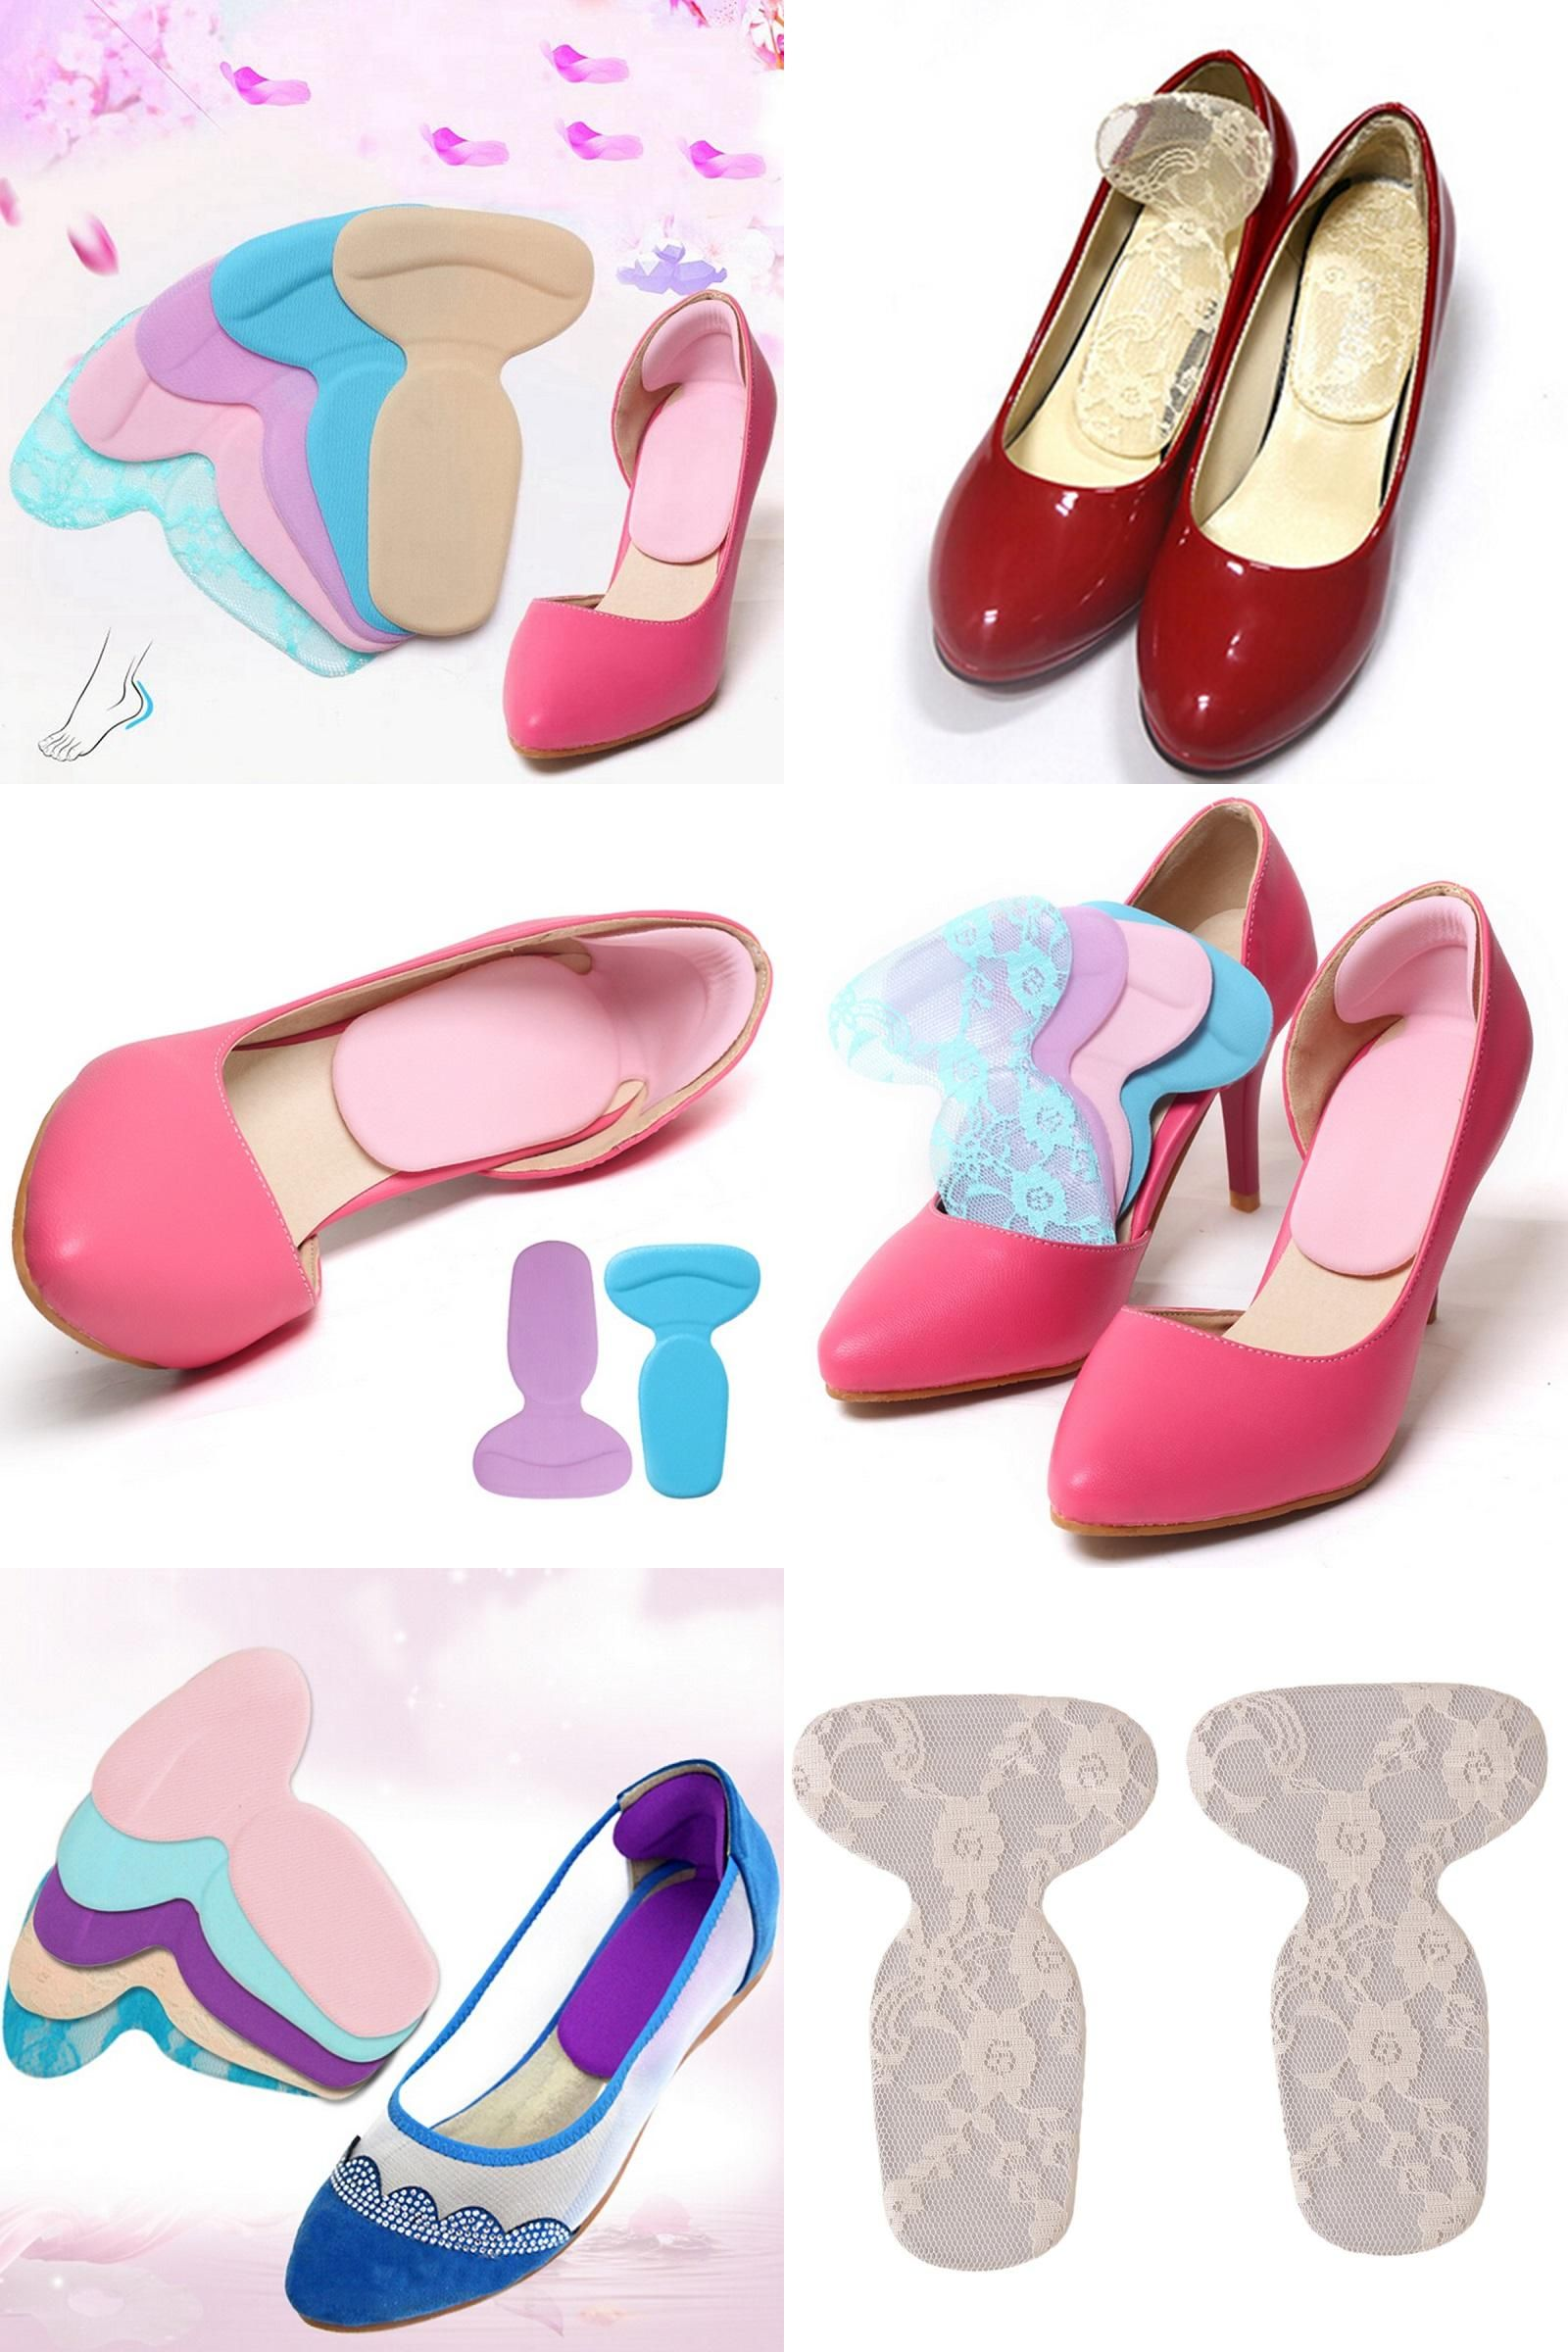 1Pair Shoe Insoles Cushions Soft Anti Pain Insoles Shoe Pads Shoe Accessories